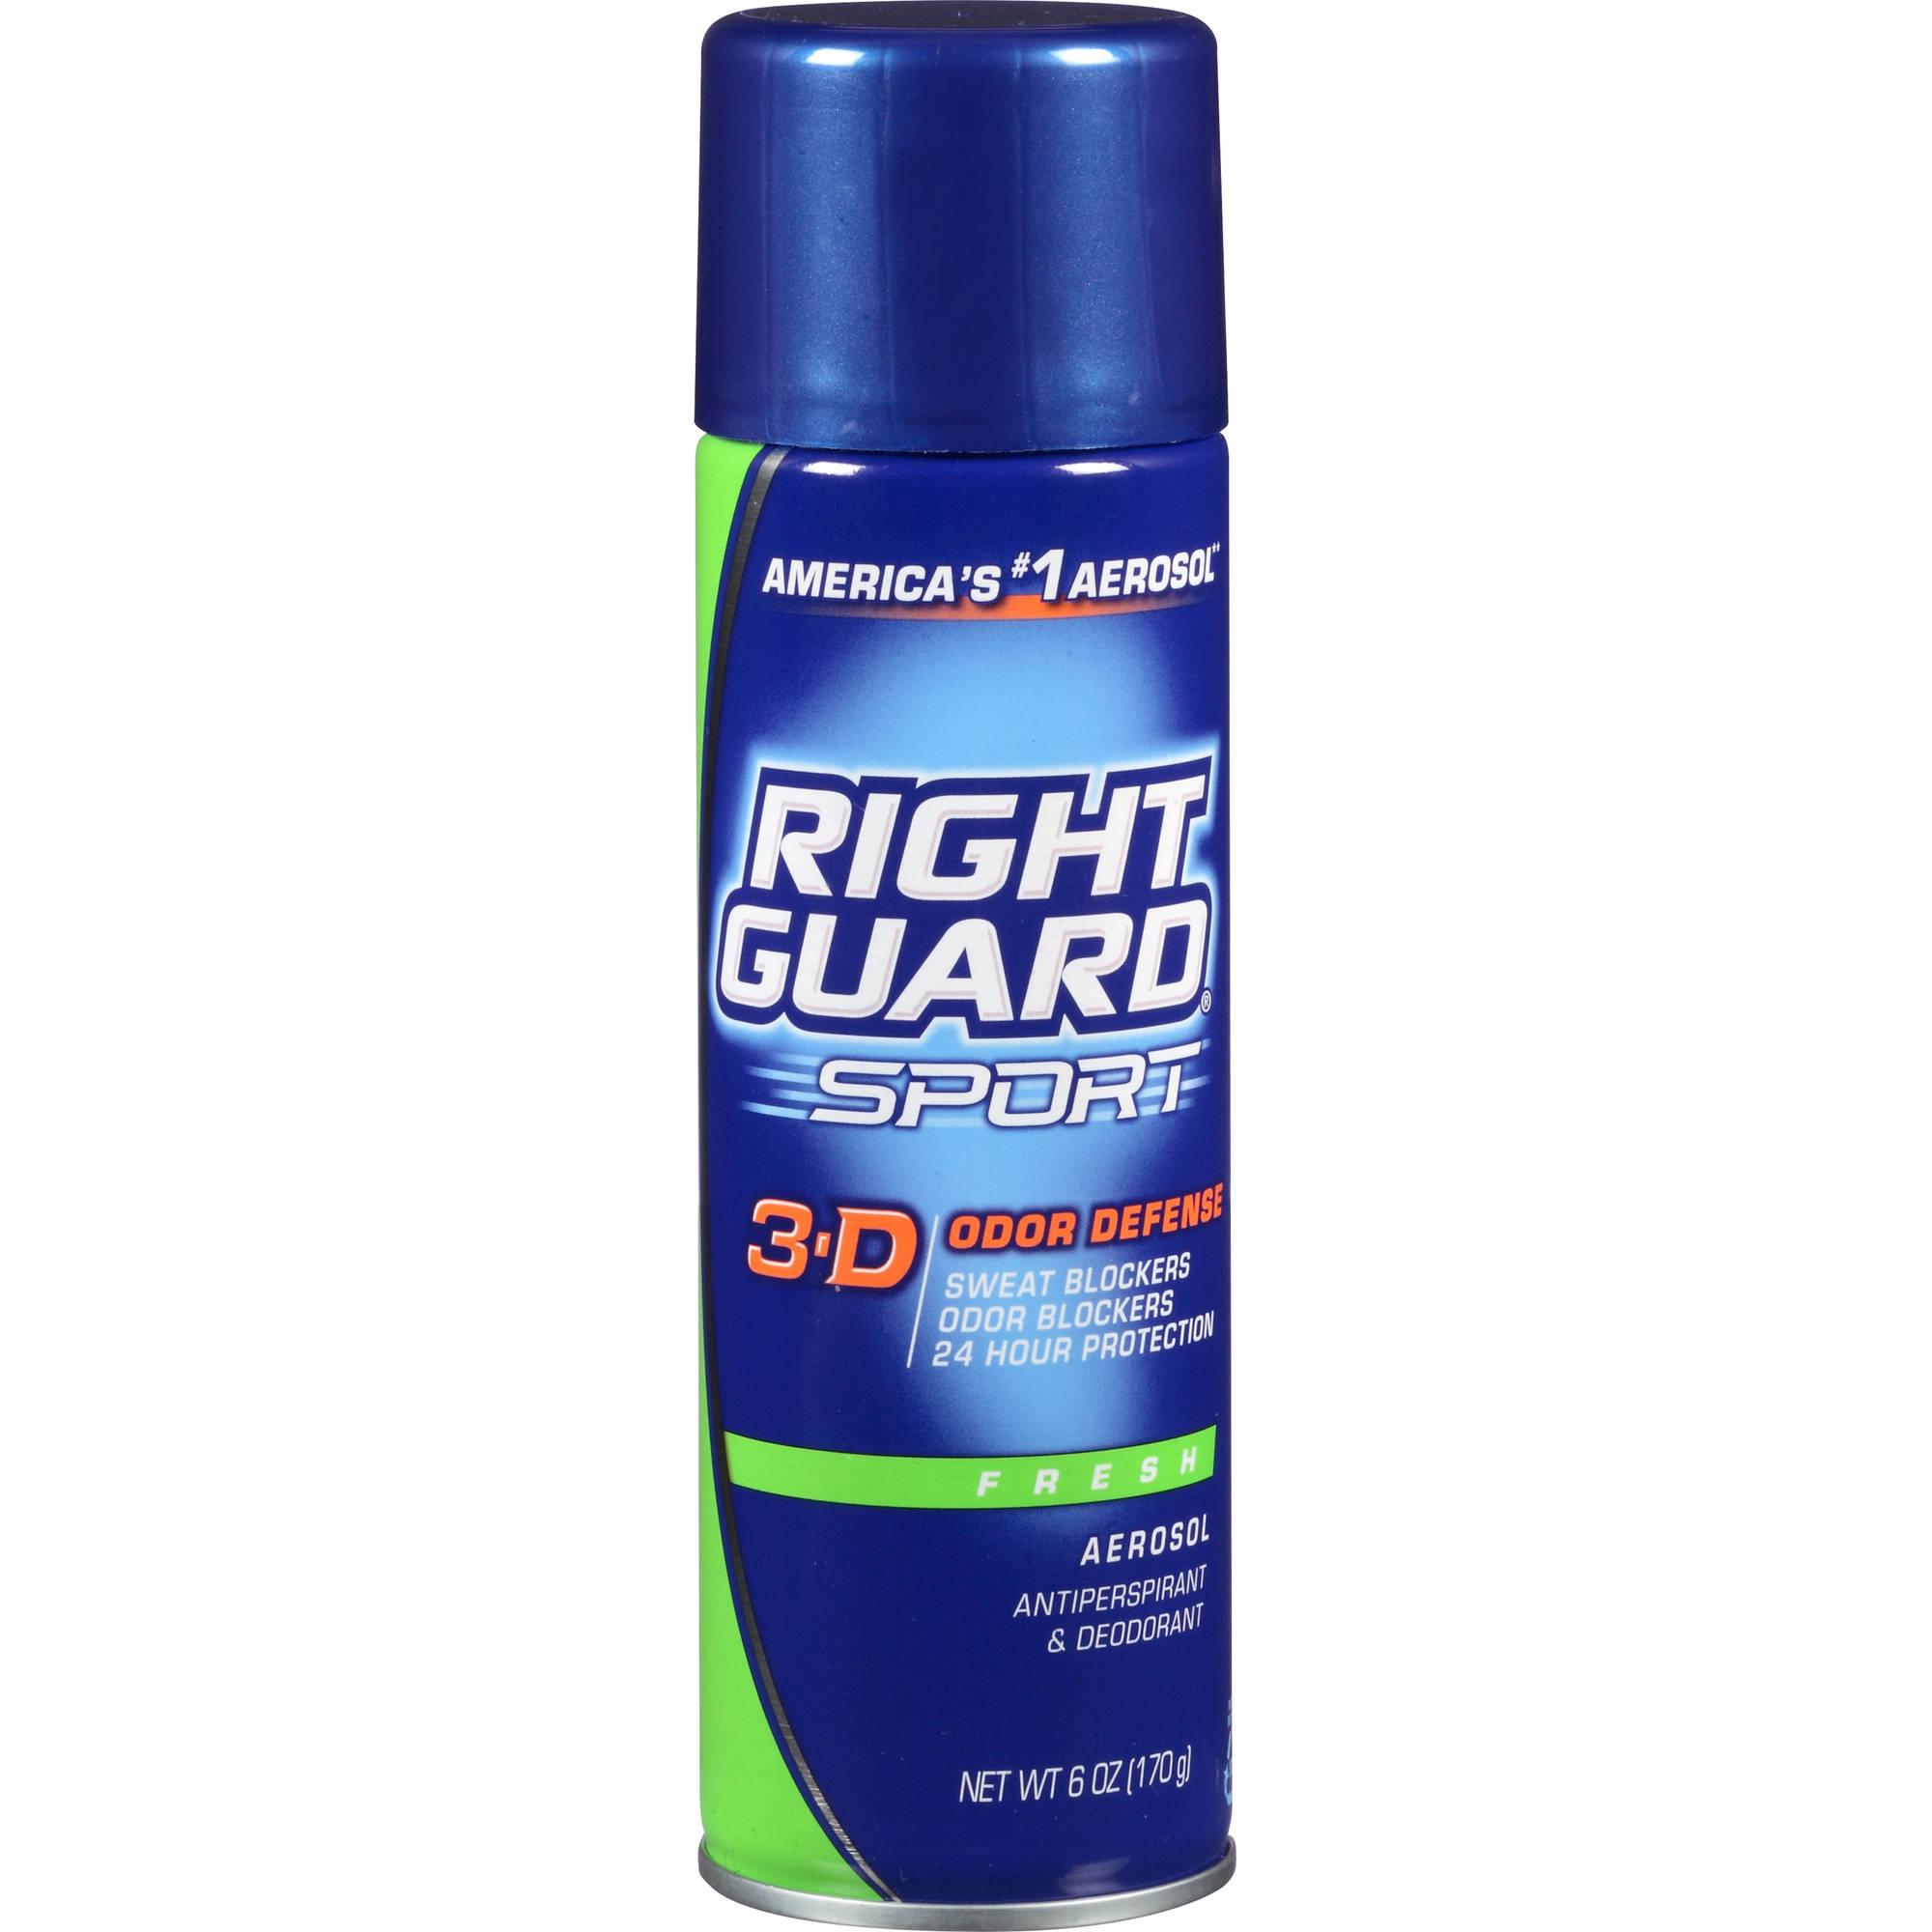 Right Guard Fresh Anti-Perspirant Deodorant, 6 oz